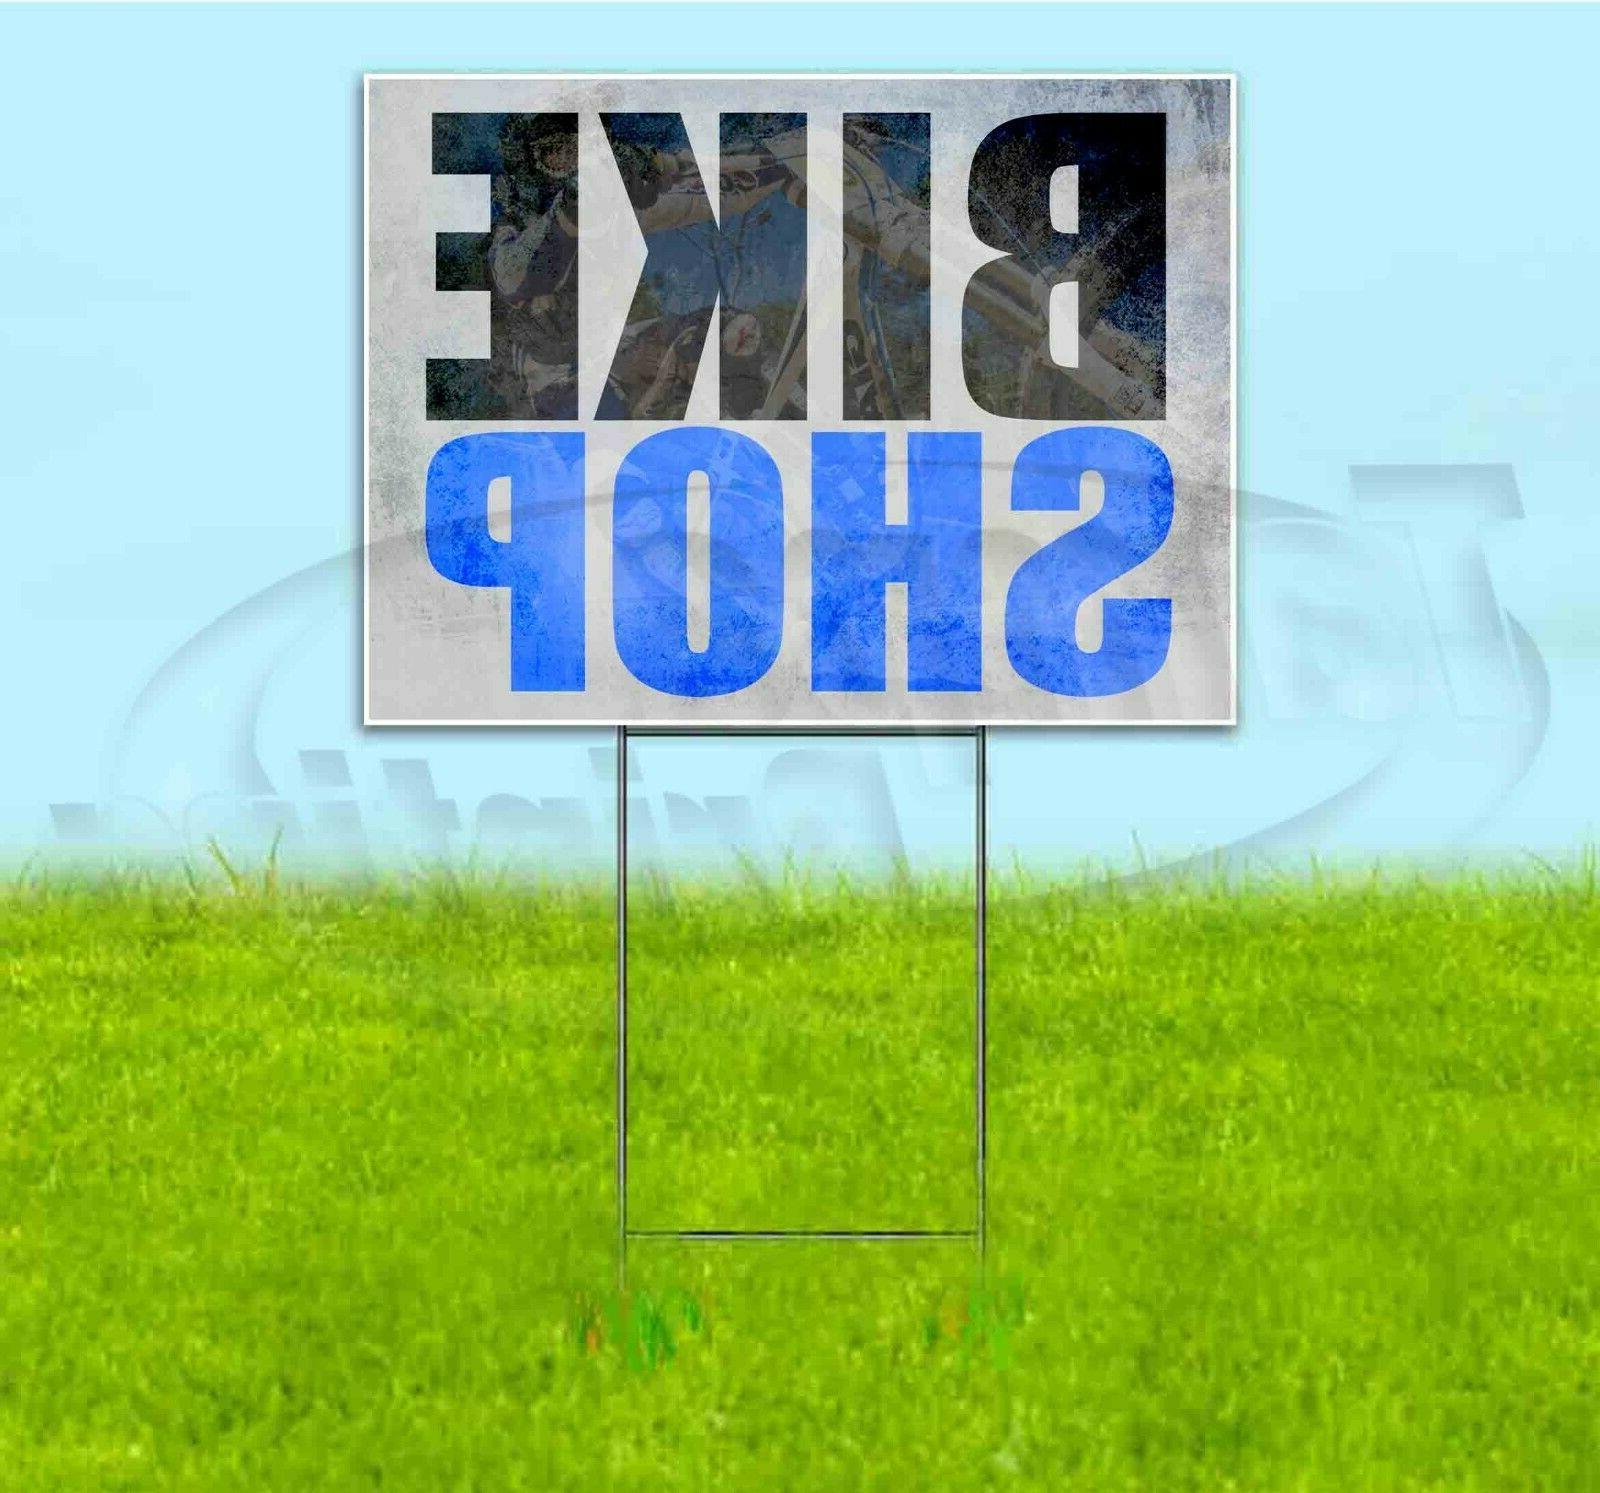 bike shop 18x24 yard sign corrugated plastic